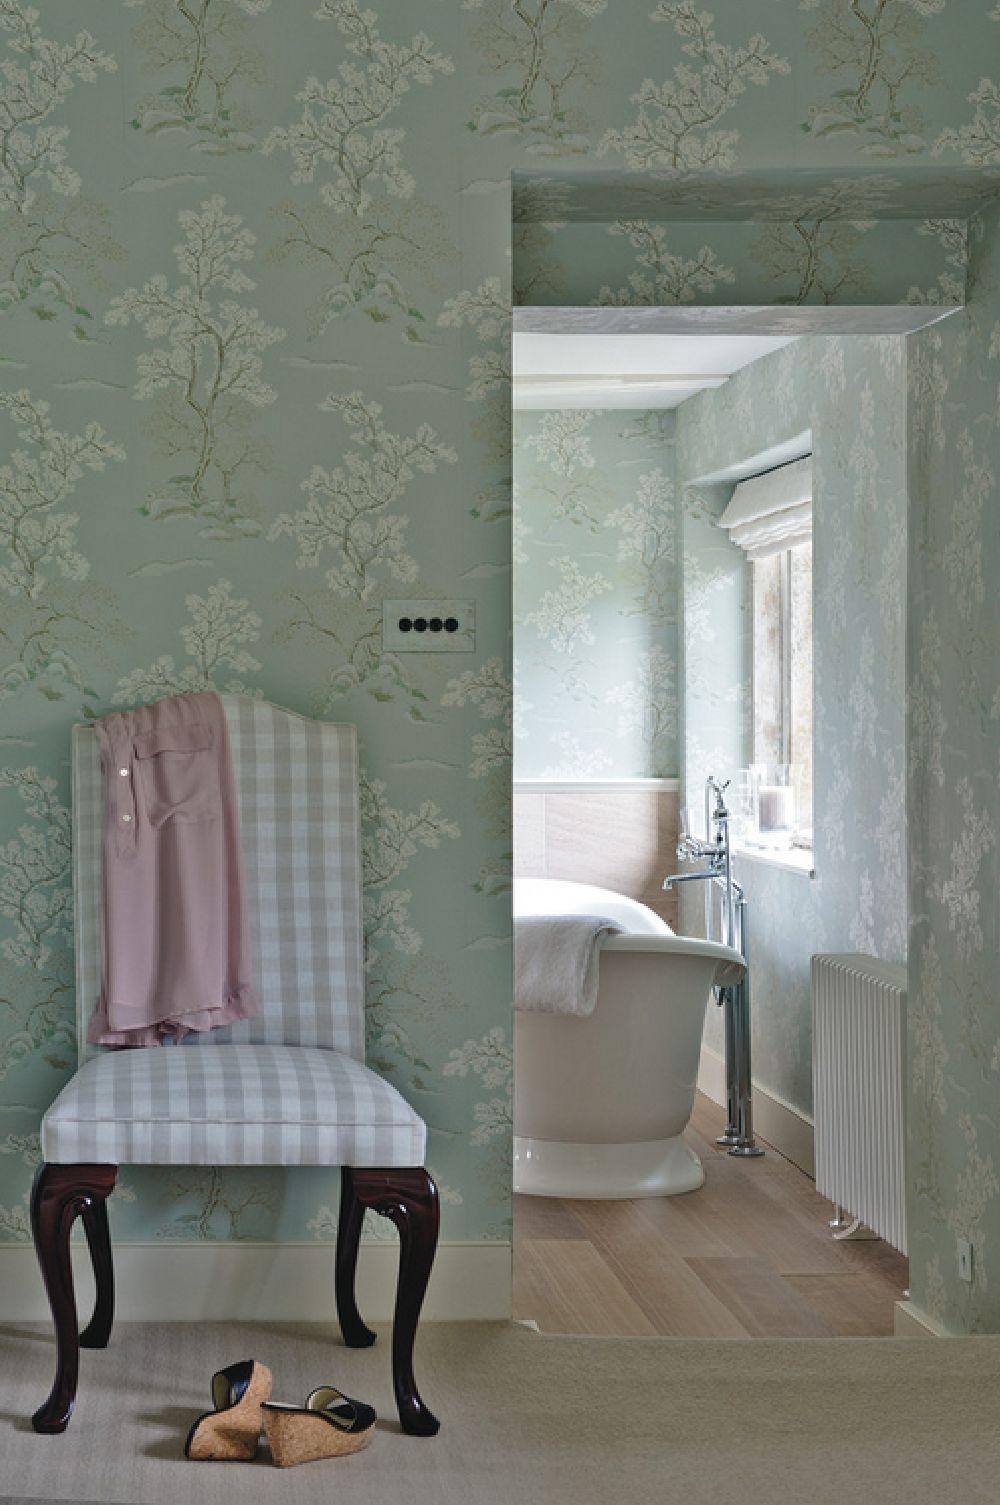 adelaparvu.com despre casa veche Anglia decorata in pasteluri, Design Interior Sims Hilditch Interior Design, Foto Polly Eltes  (3)